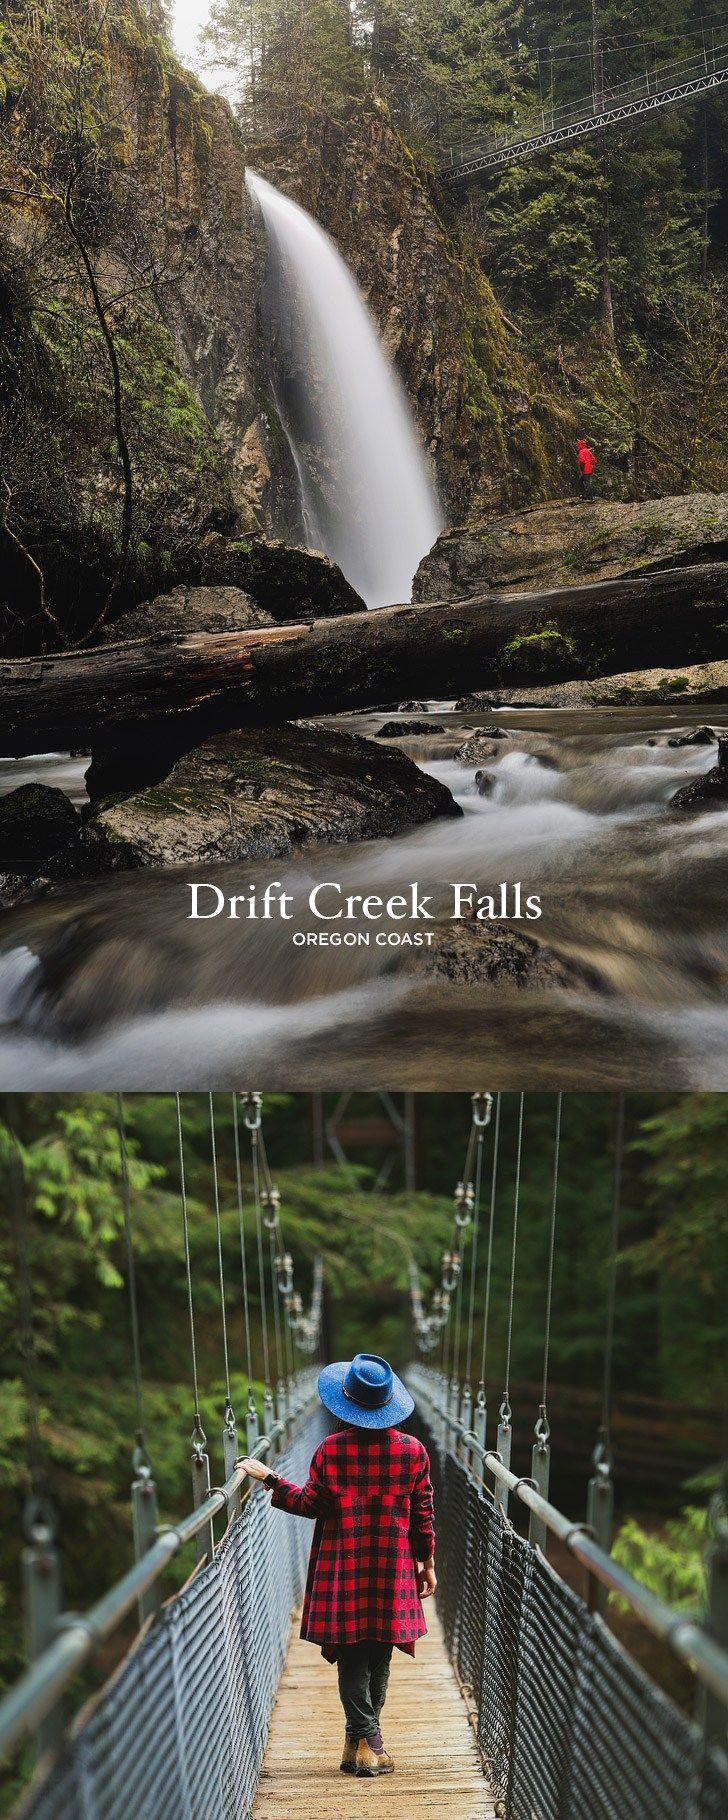 Amazing Hike on the Oregon Coast - Photo Guide to Drift Creek Falls Hike, Lincoln City #oregon #hiking #hikes #traveloregon #pnw // localadventurer.com